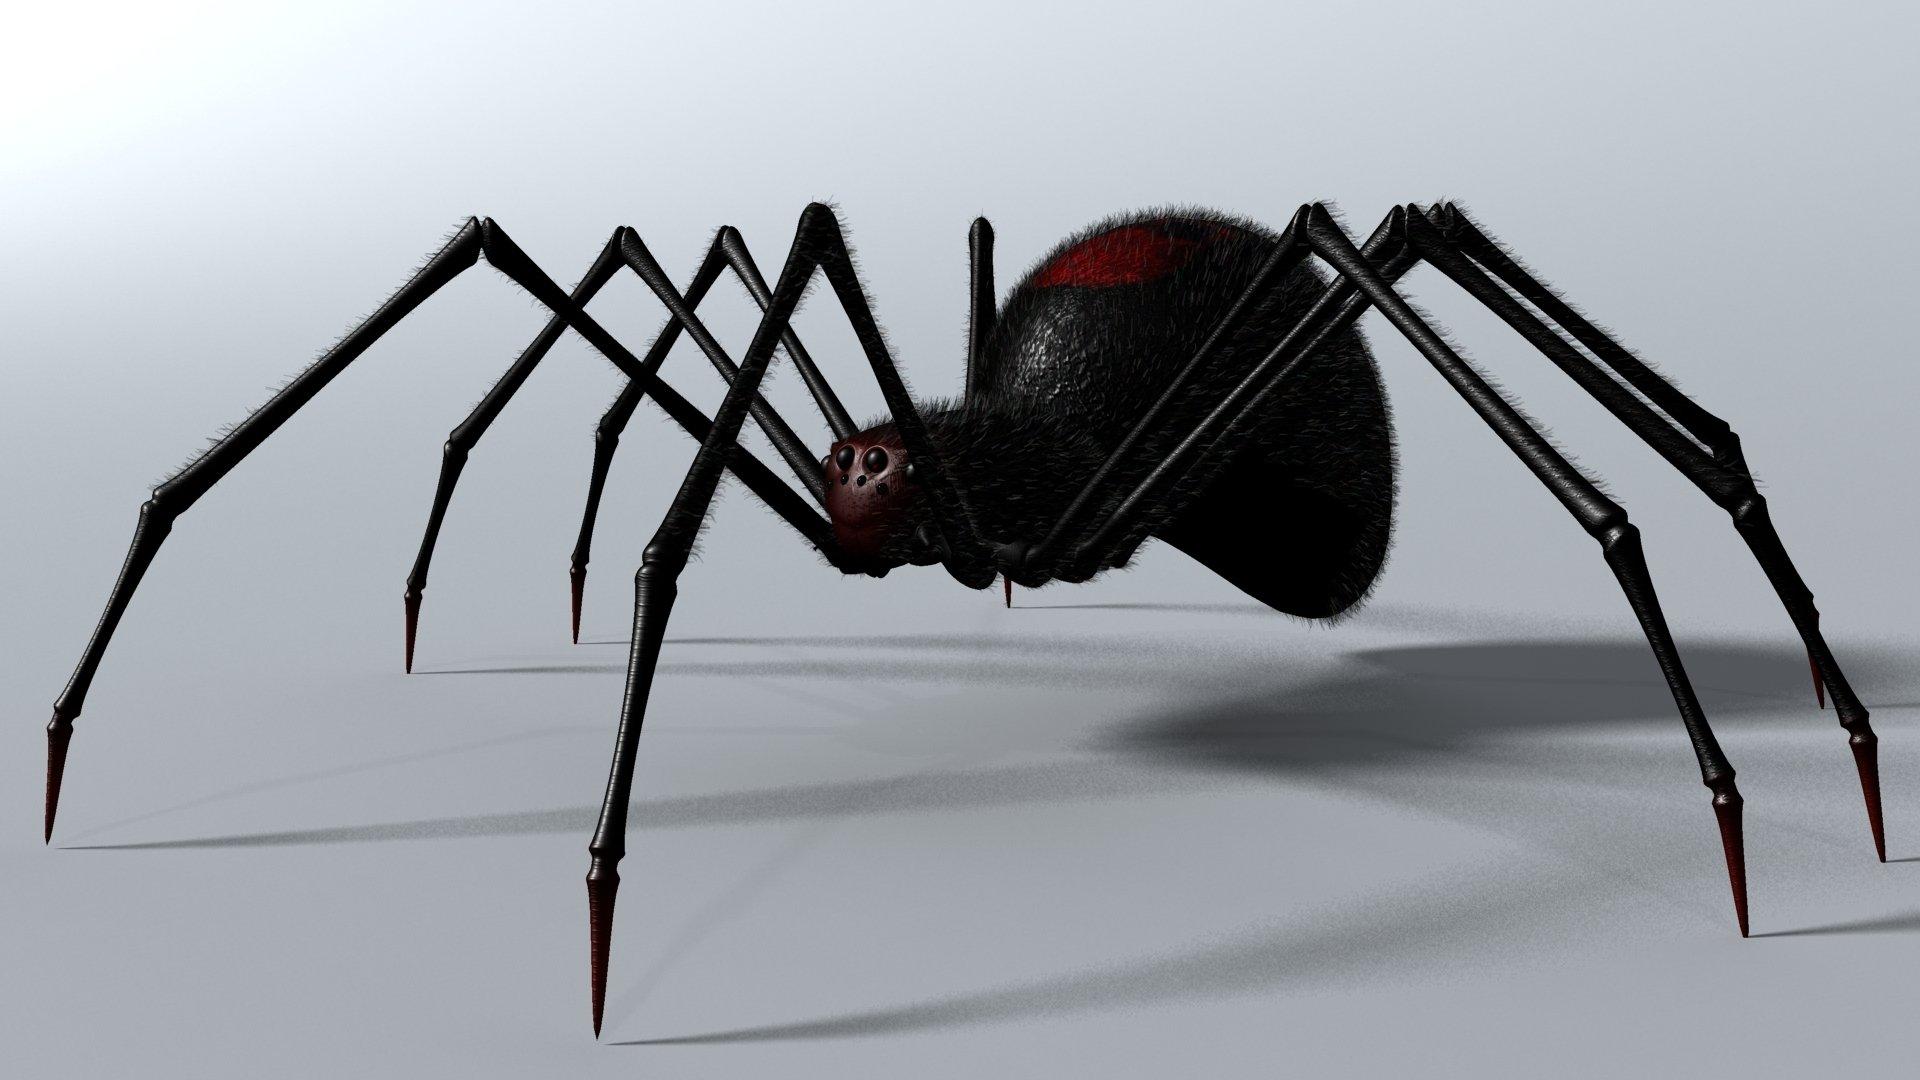 CGI - Spider  3D Animal CGI Digital Arachnid Black Wallpaper